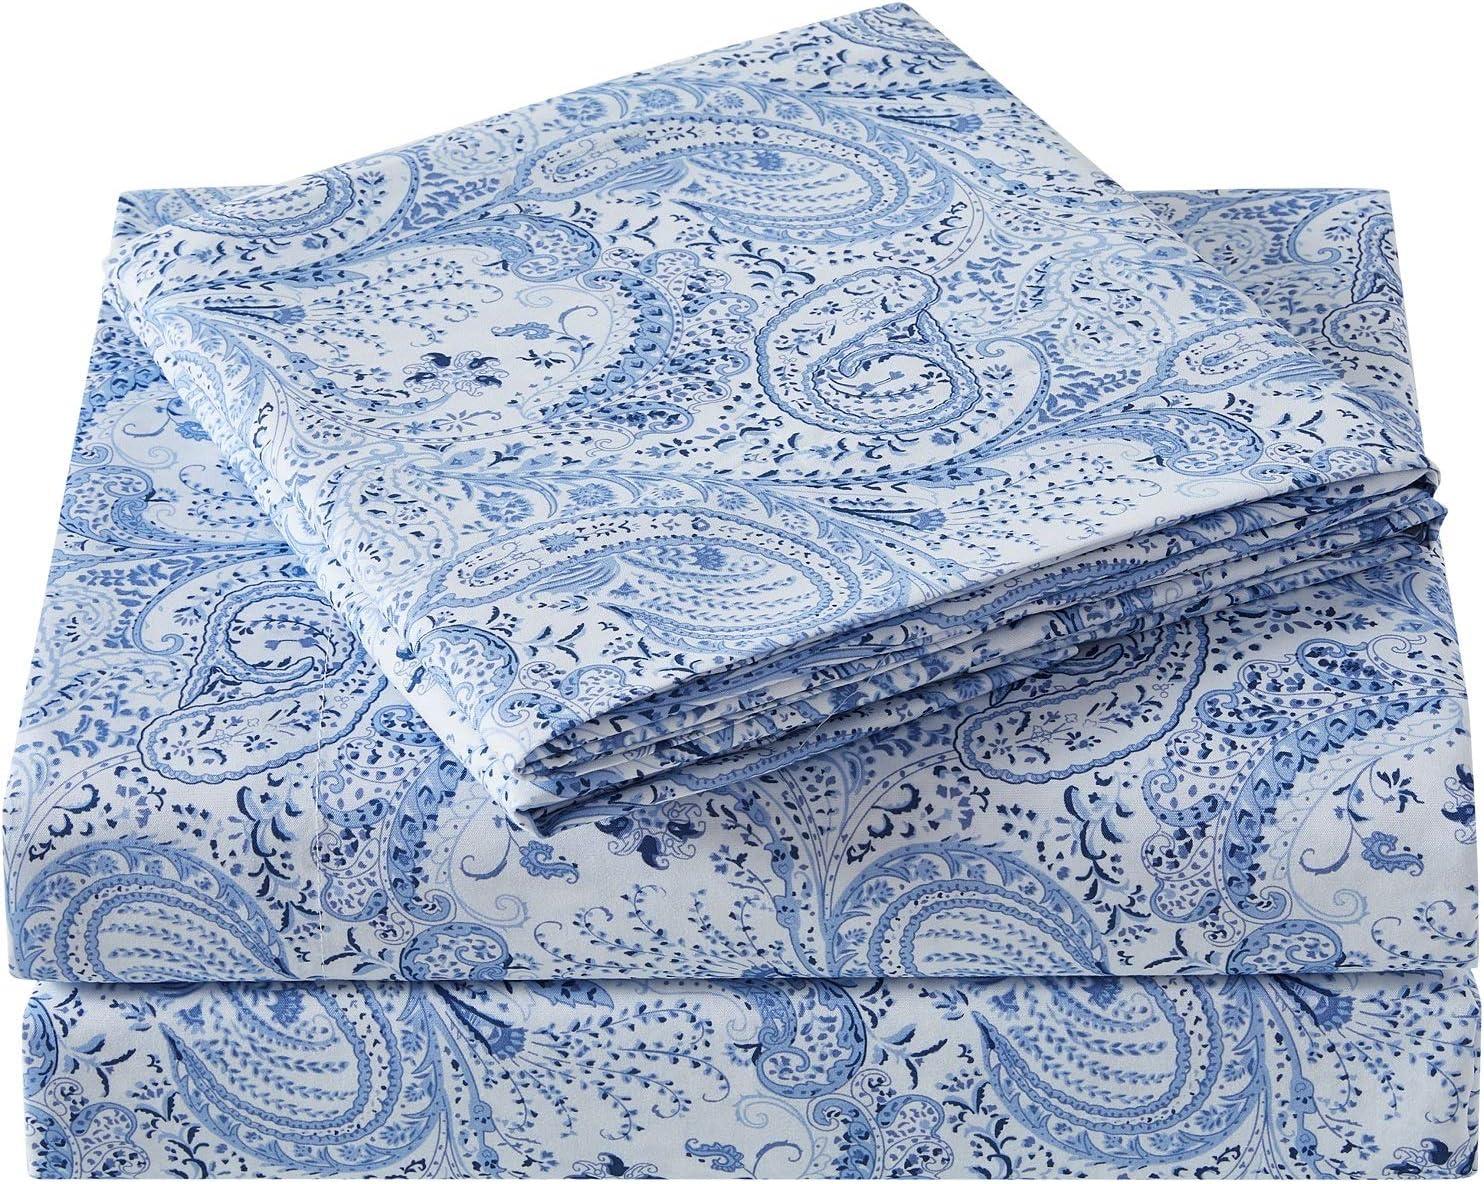 Bed Sheet Set 4 Pc Paisley Blue